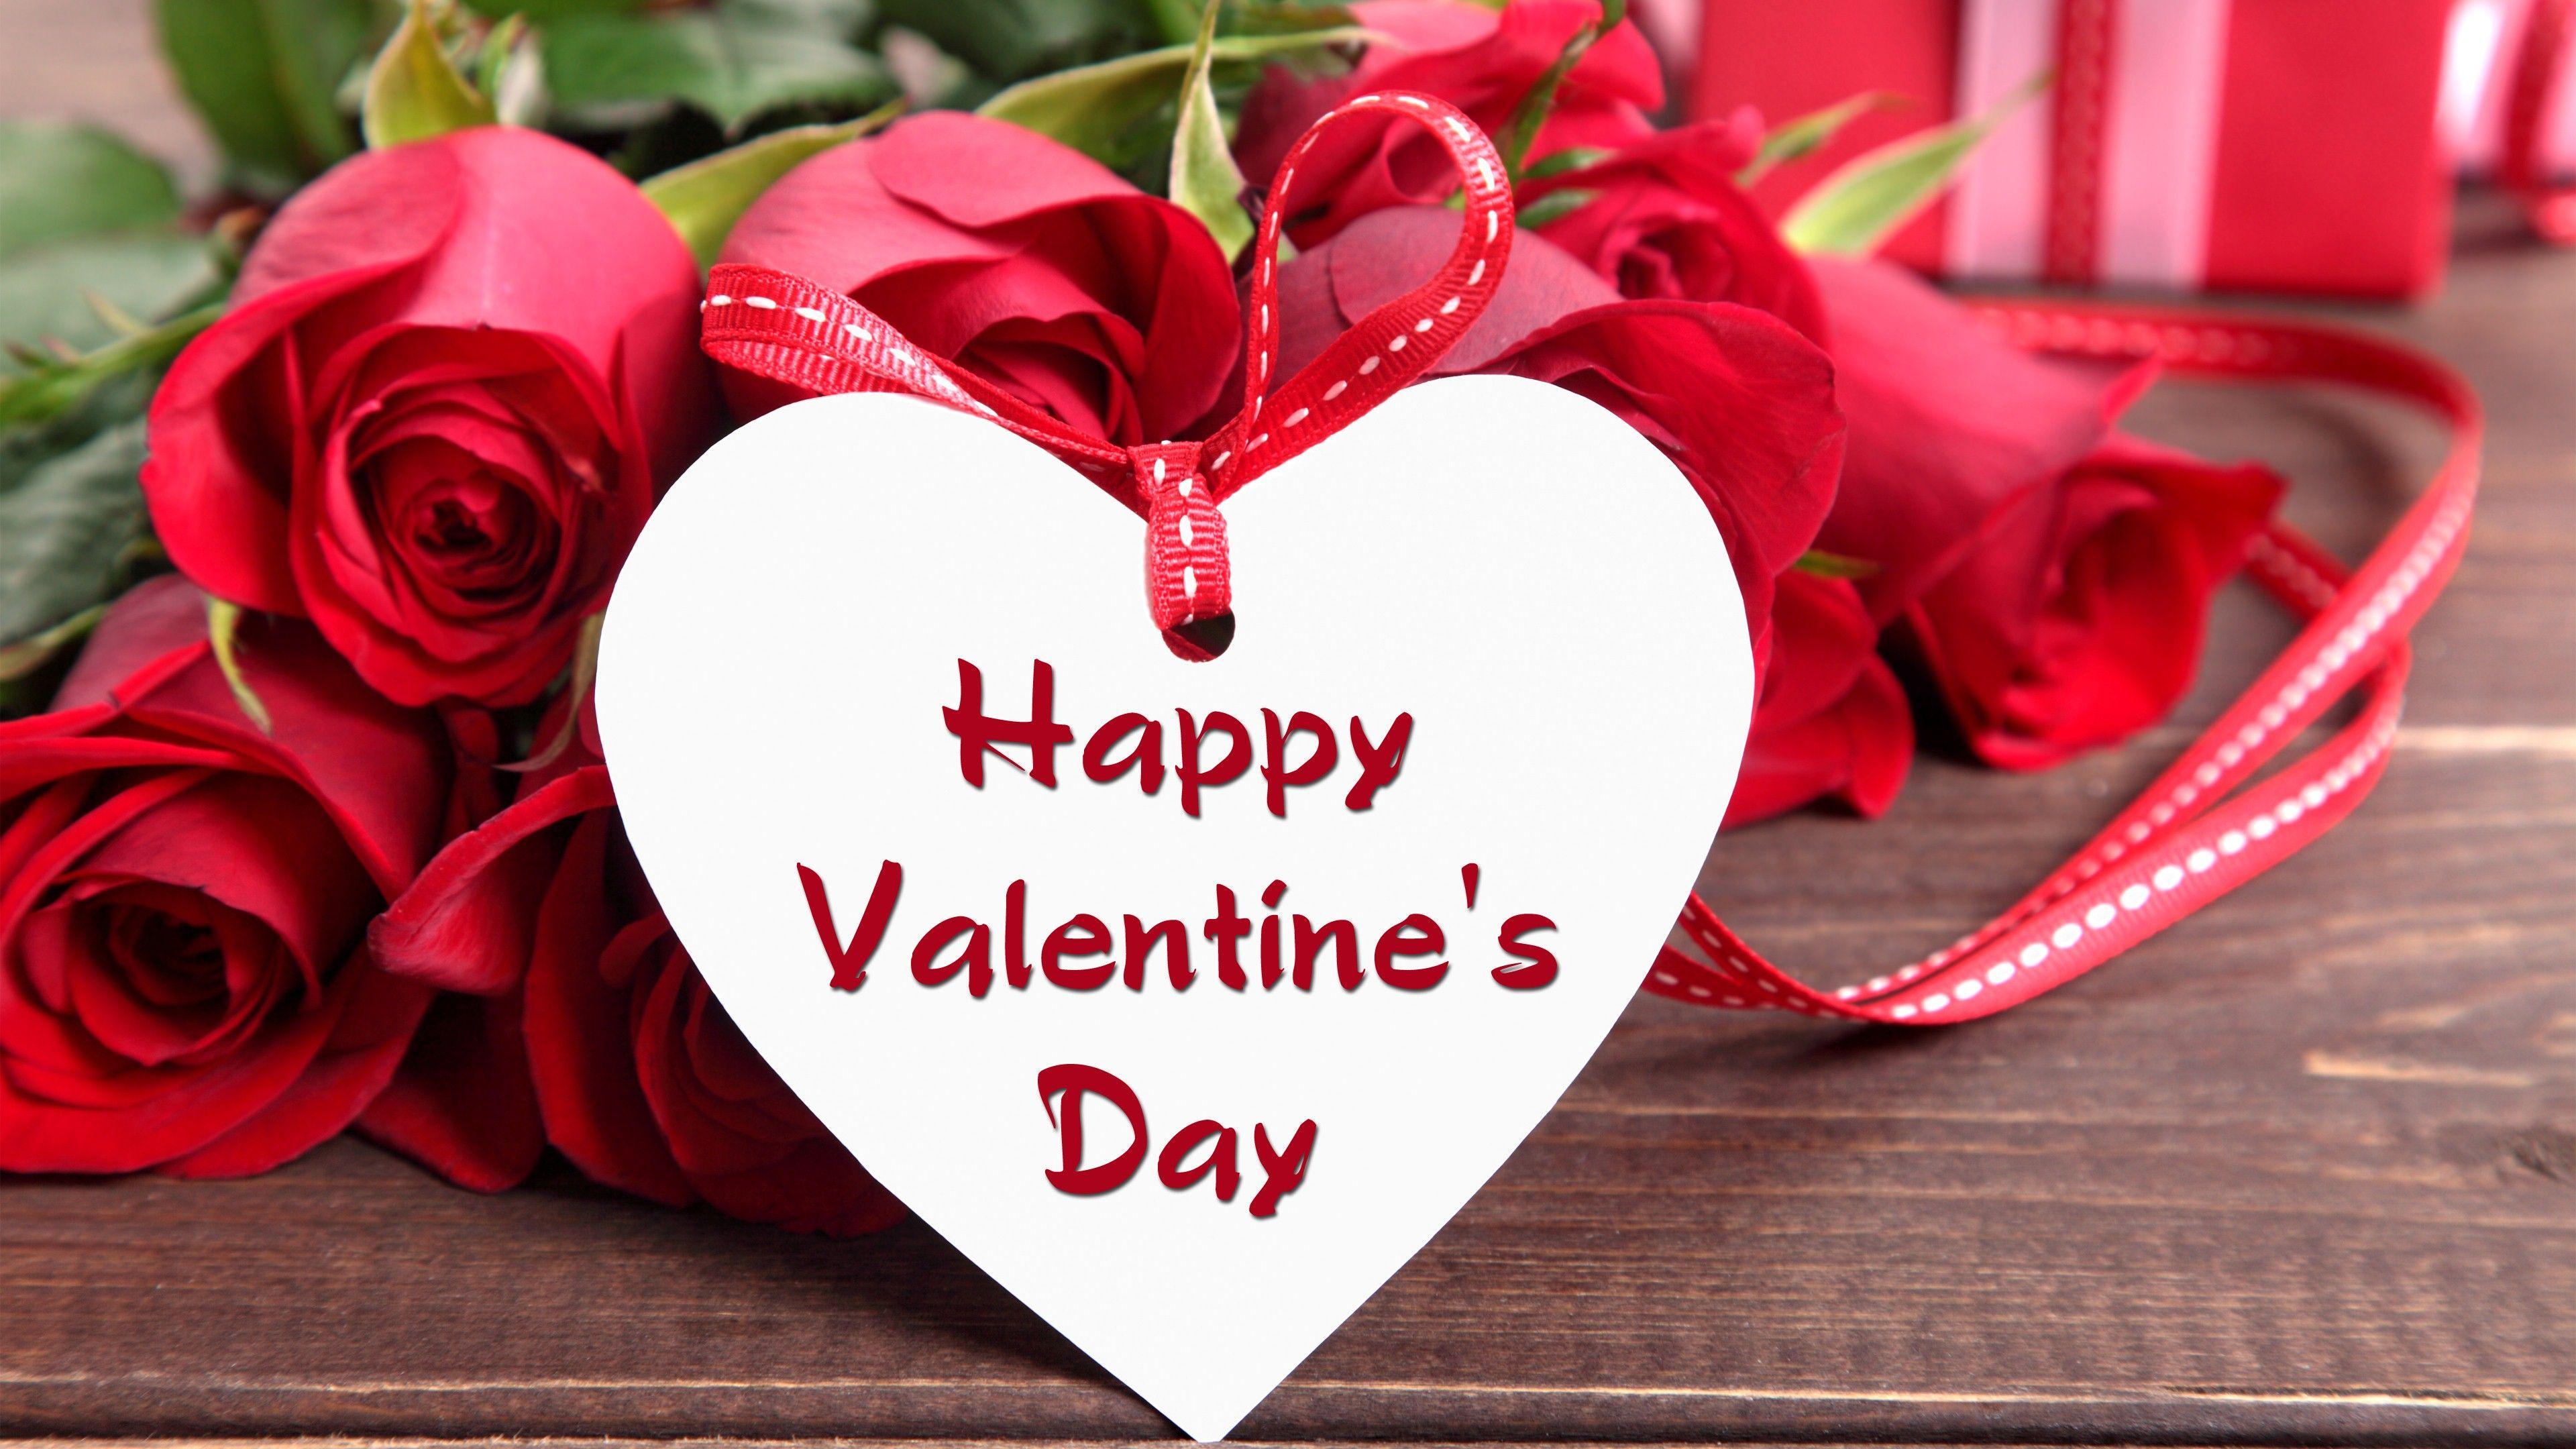 3840x2160 Happy Valentines Day Image, Pics, Photo & Wallpaper